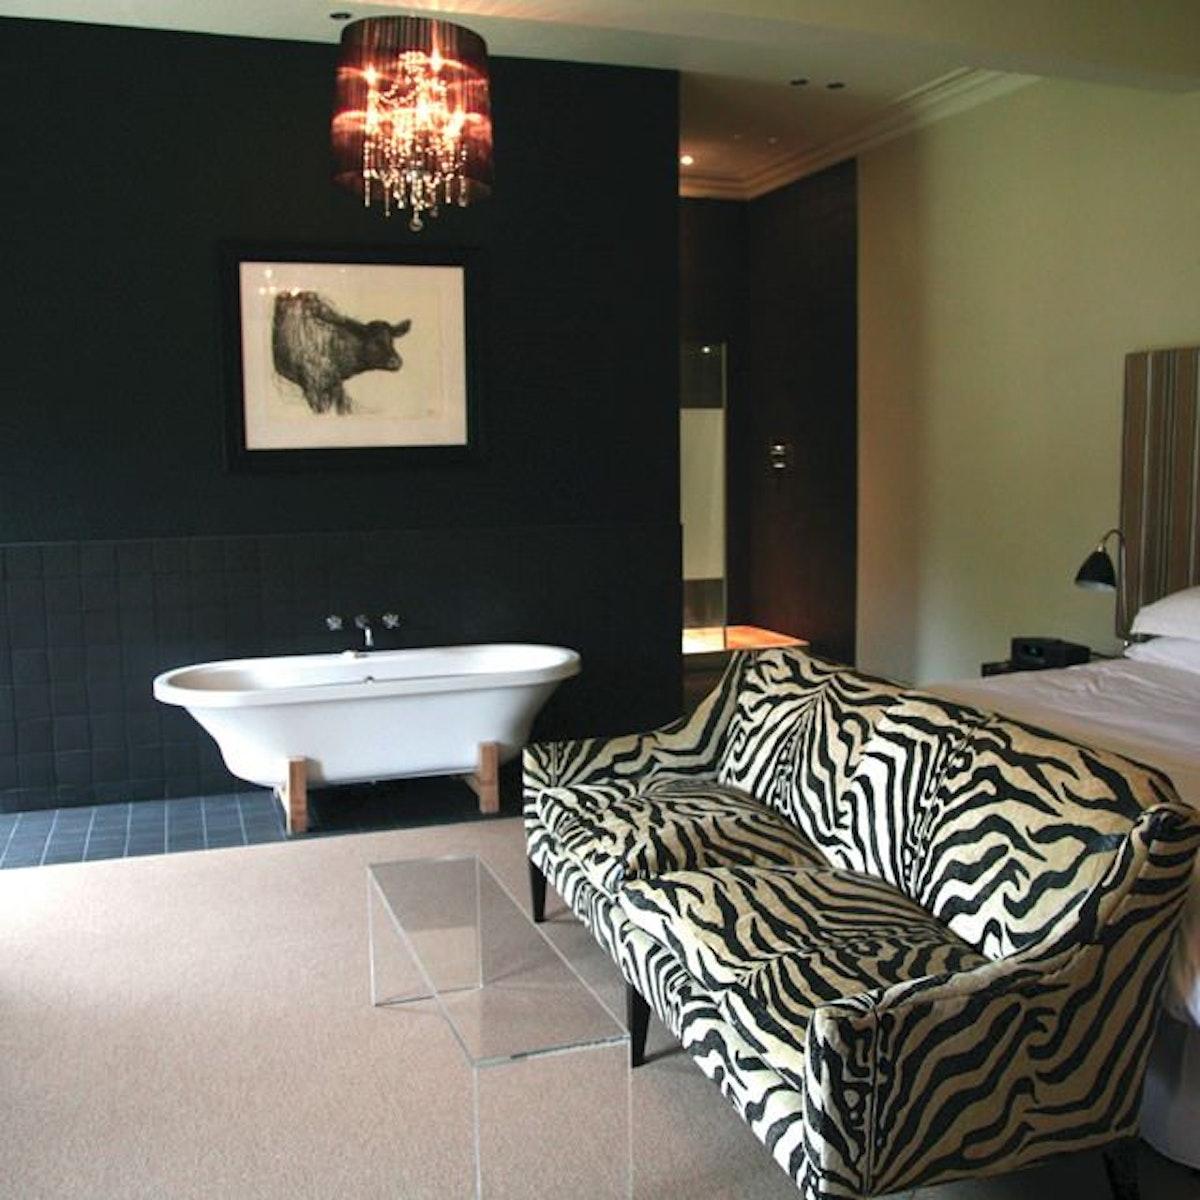 Romantic Country Hotels Uk: Best Romantic Hotels UK